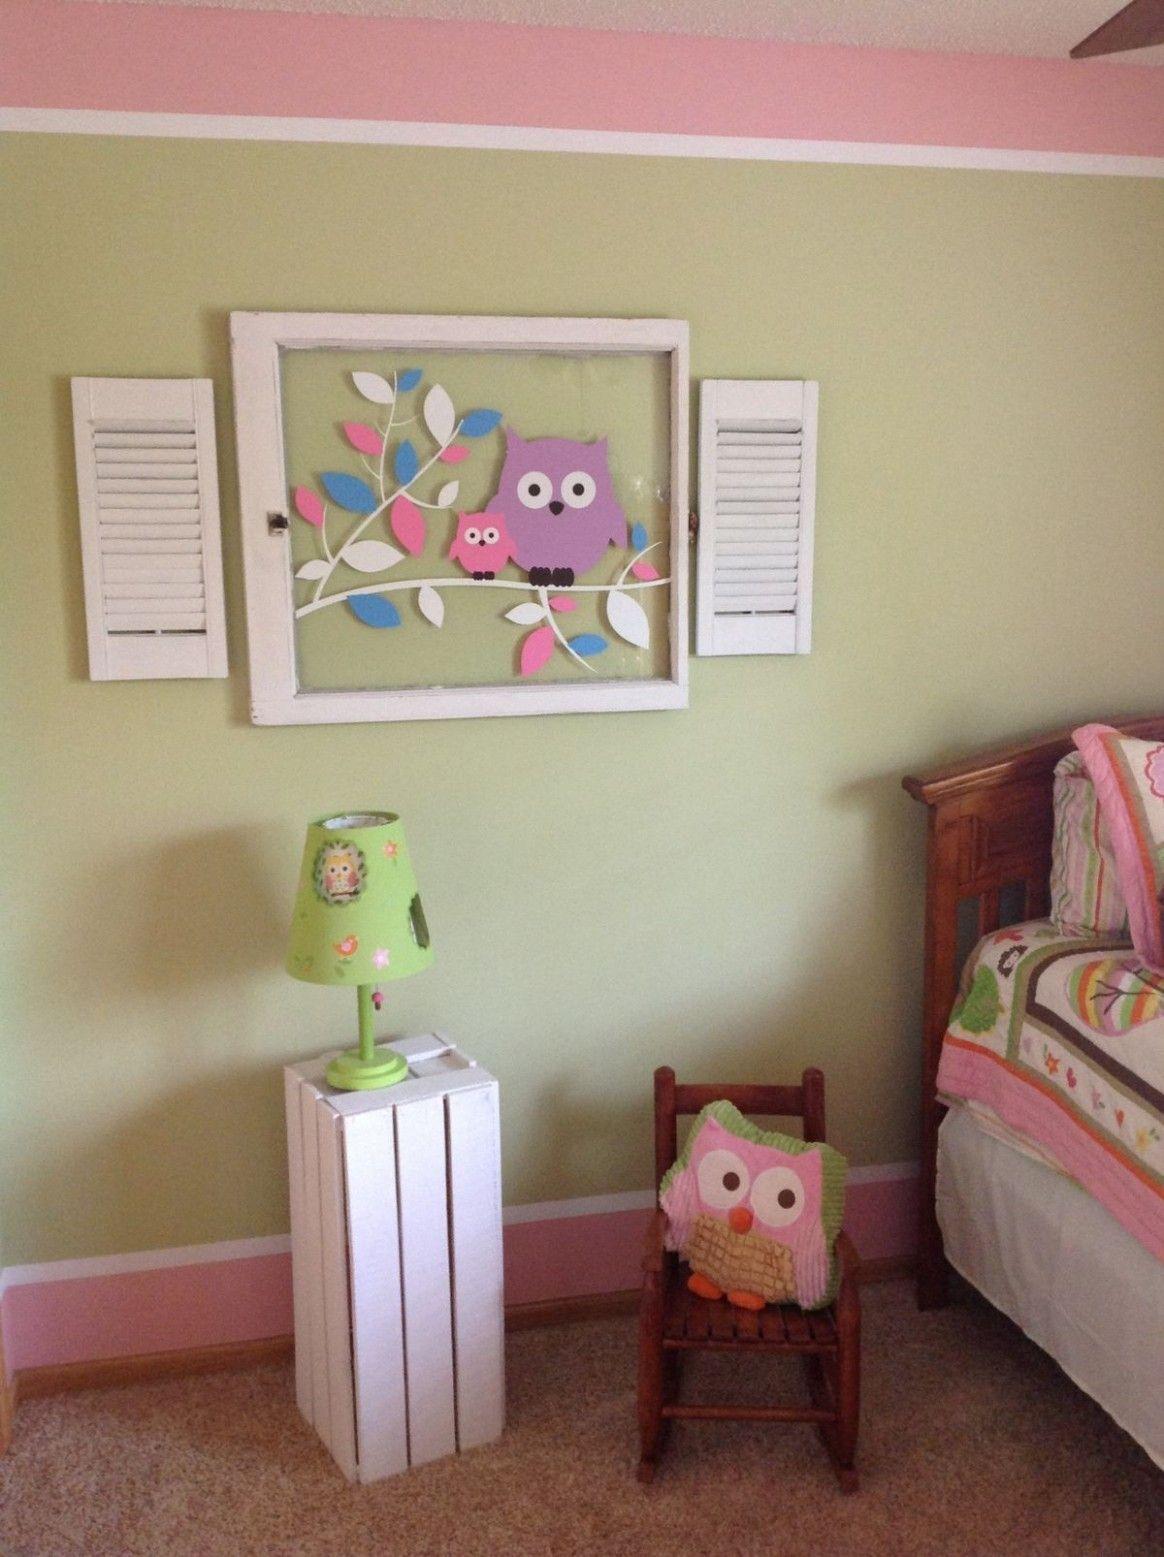 Owl Bedroom Decor in 9  Owl bedrooms, Owl bedroom decor, Owl room